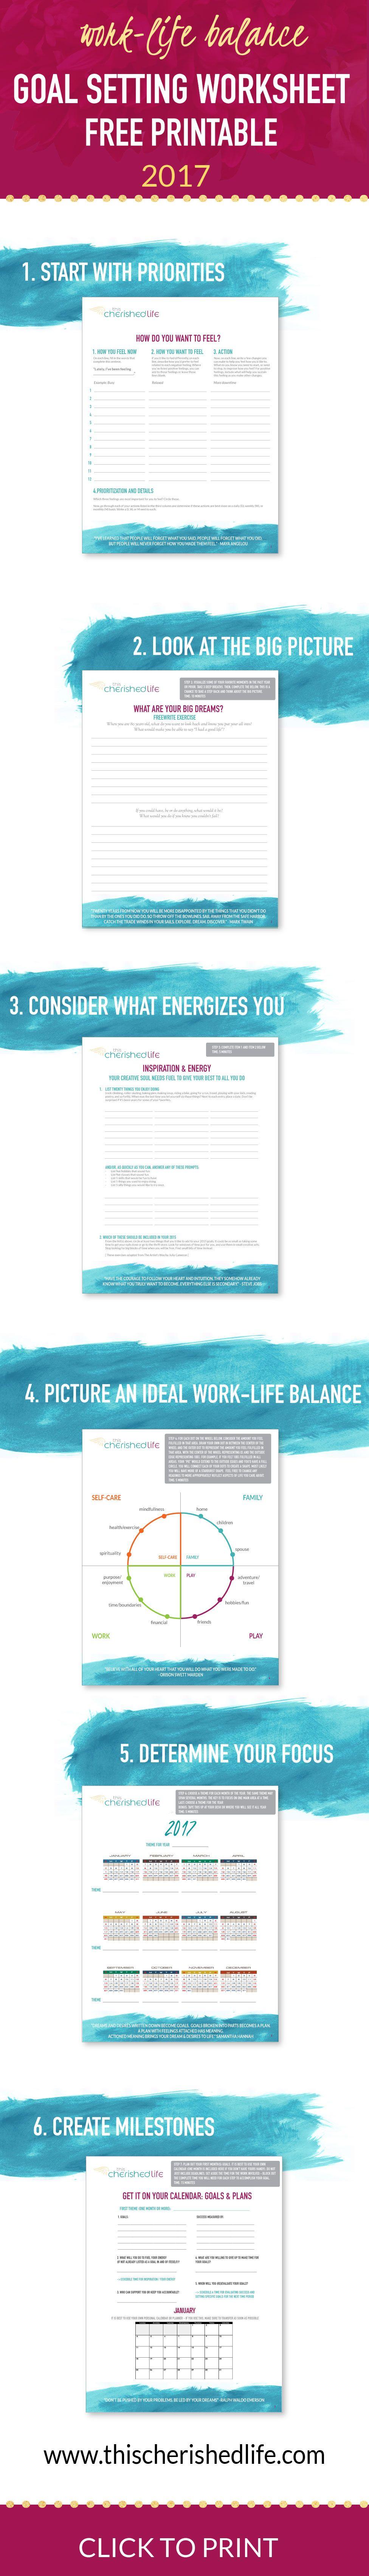 goal setting printable worksheet set goals that matter 2017 goal setting printable worksheet set goals that matter for work life balance especially